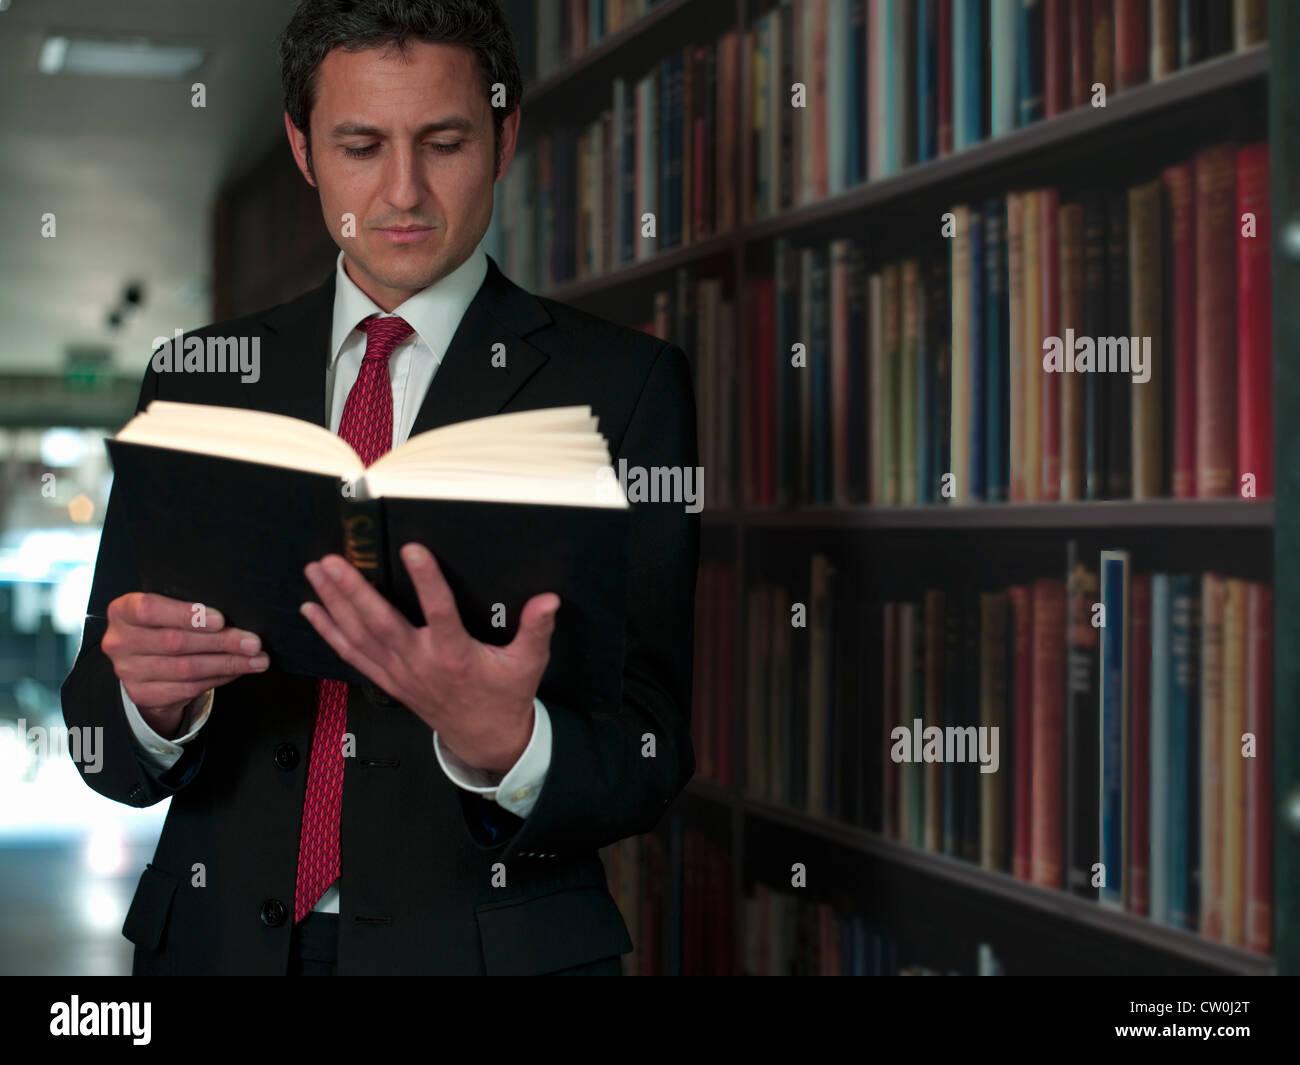 Geschäftsmann Lesebuch in Bibliothek Stockbild